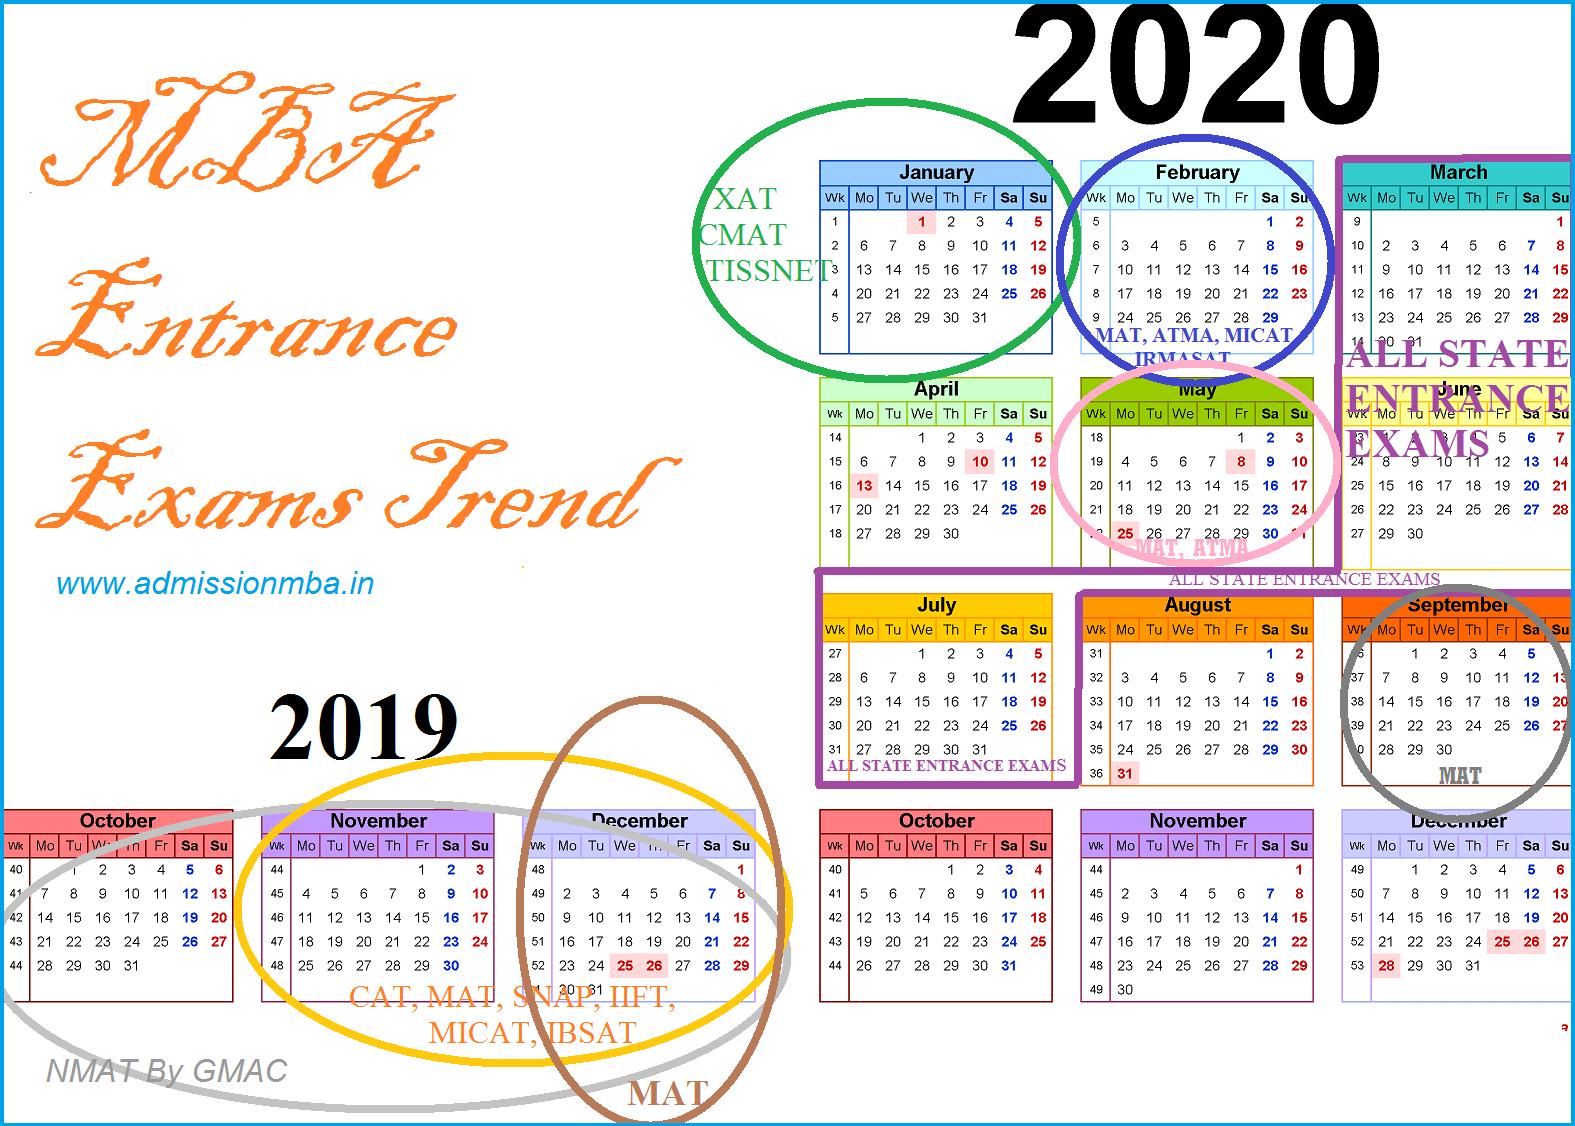 Mba Entrance Exams Calendar 2020 Top 25 Mba Entrance Dates